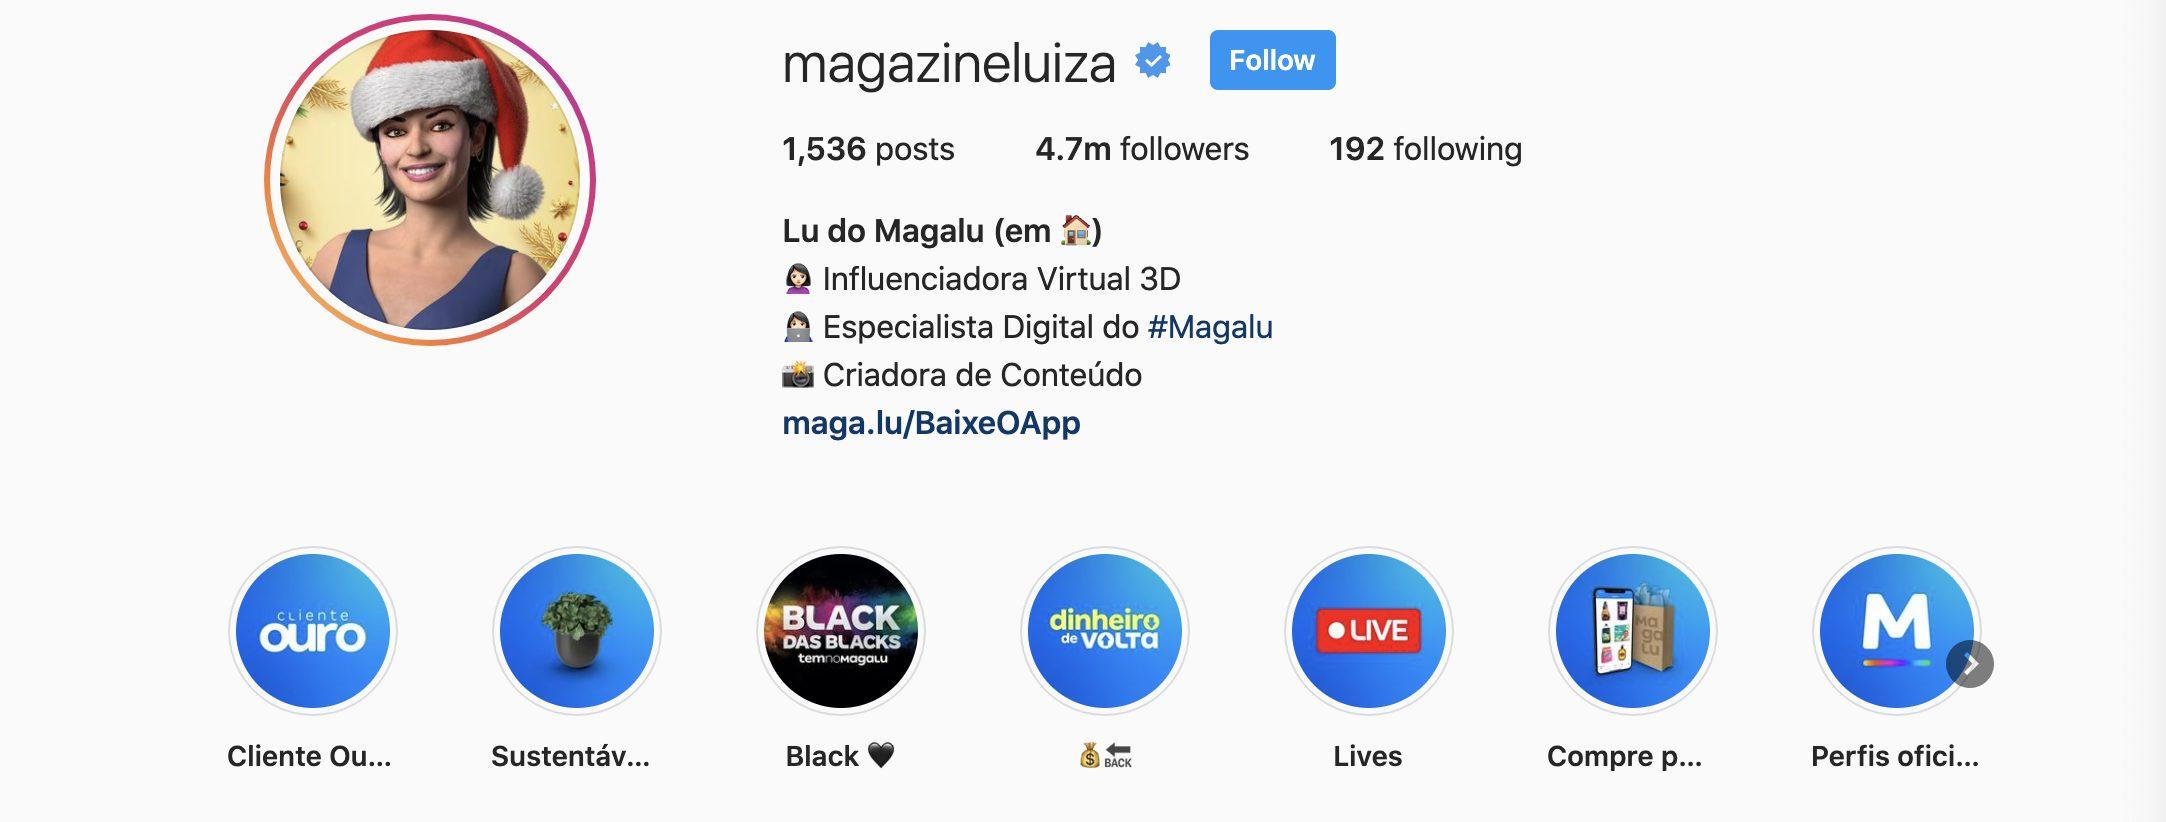 Magazine Luiza Lu virtual influencer